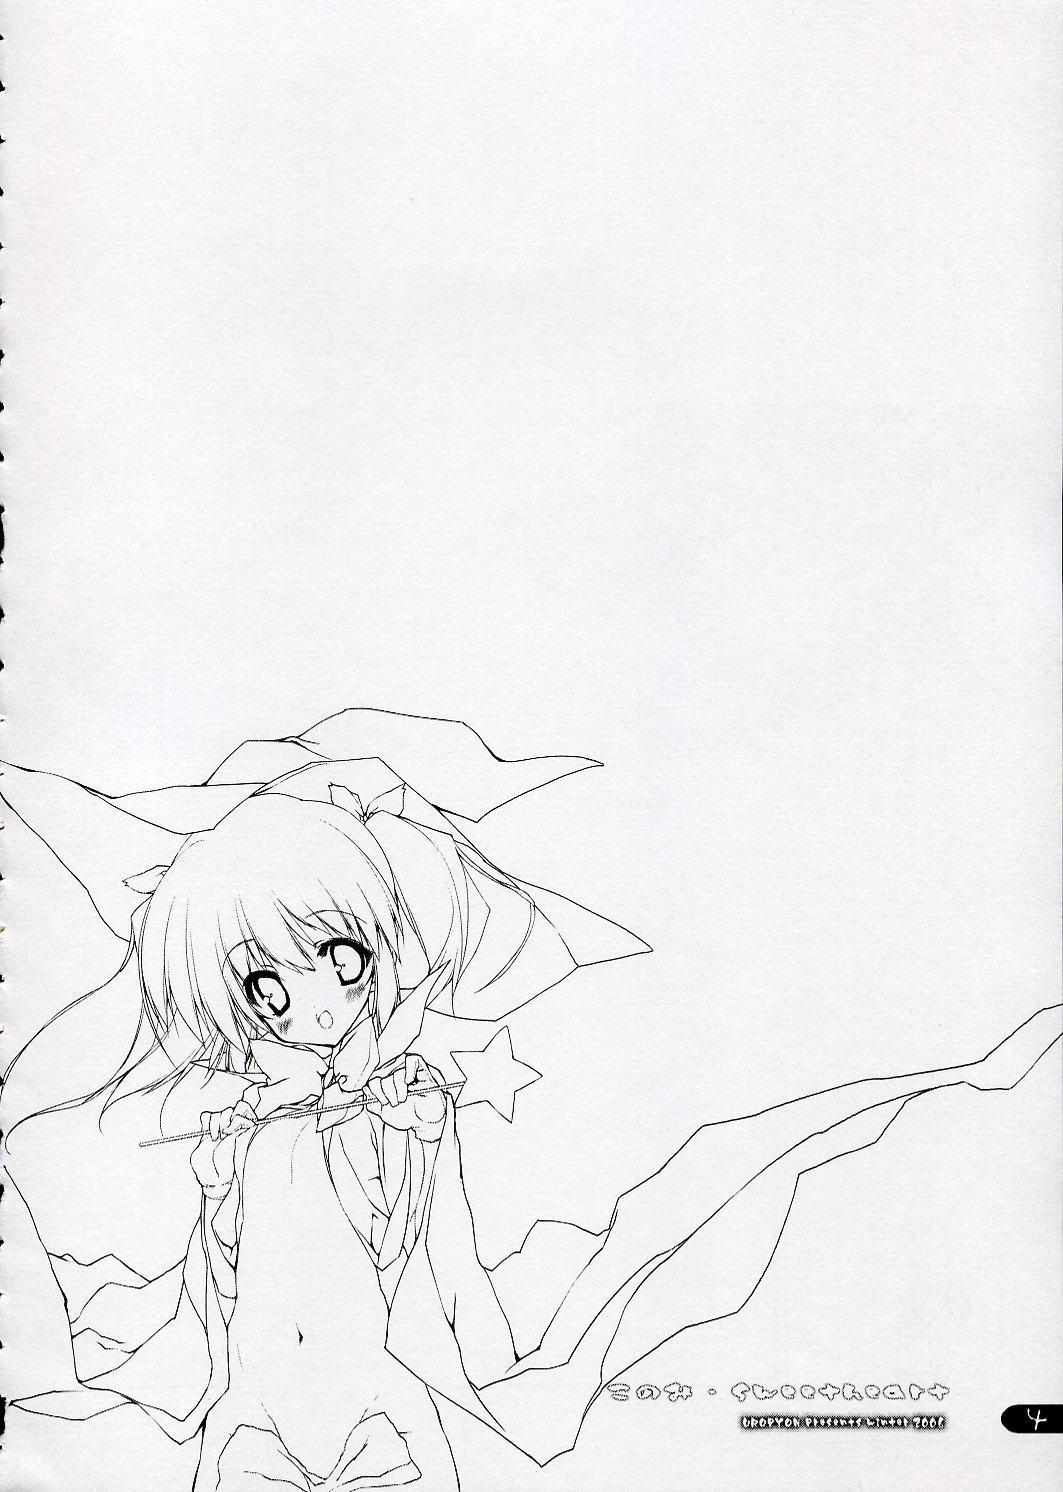 Konomi Sweetheart 2